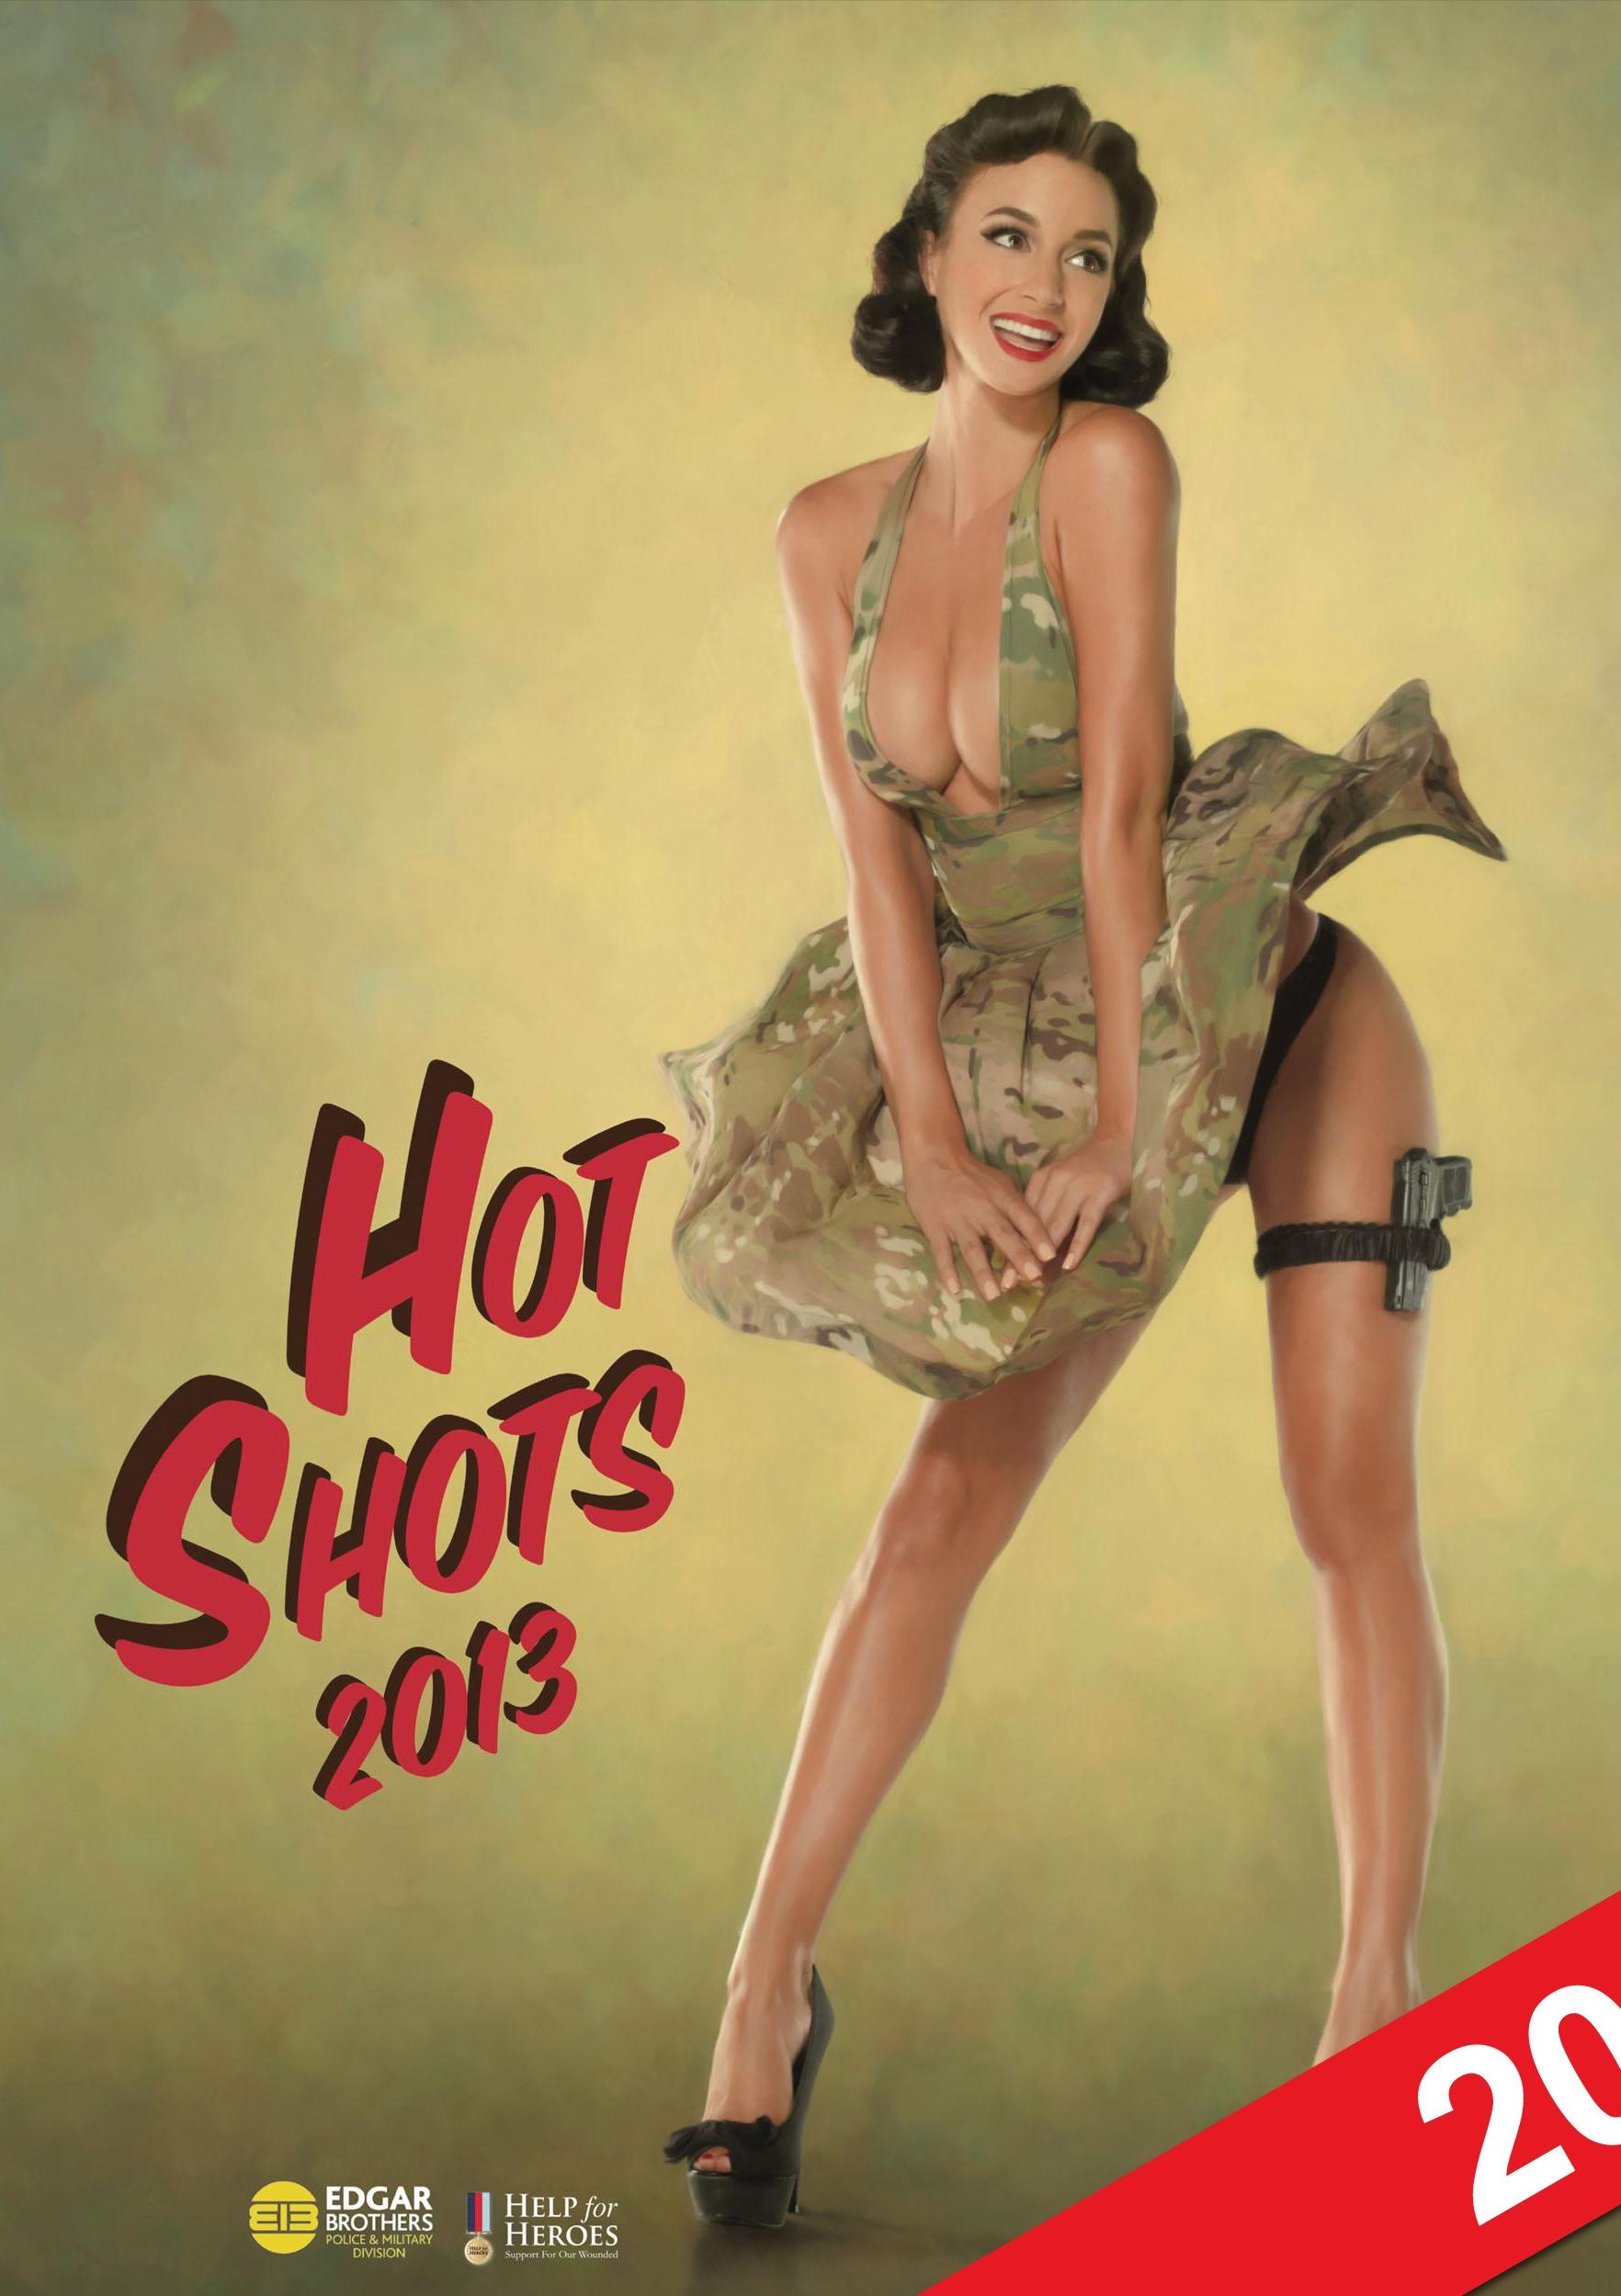 Hot shot photos erotic pics